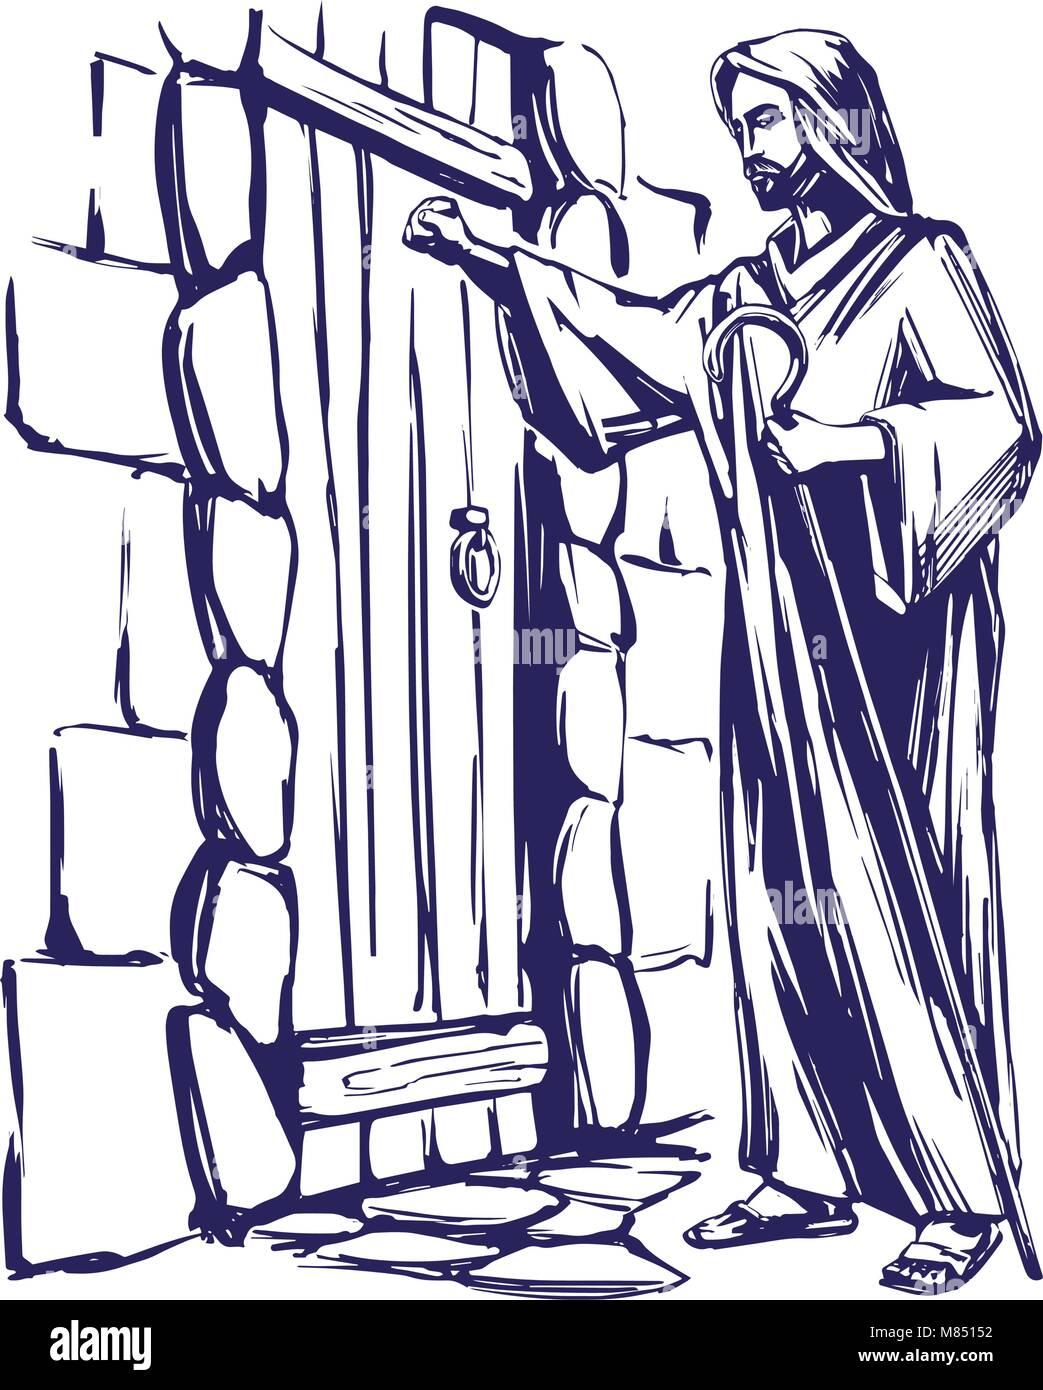 Jesus christ son of god knocking at the door symbol of jesus christ son of god knocking at the door symbol of christianity hand drawn vector illustration altavistaventures Gallery